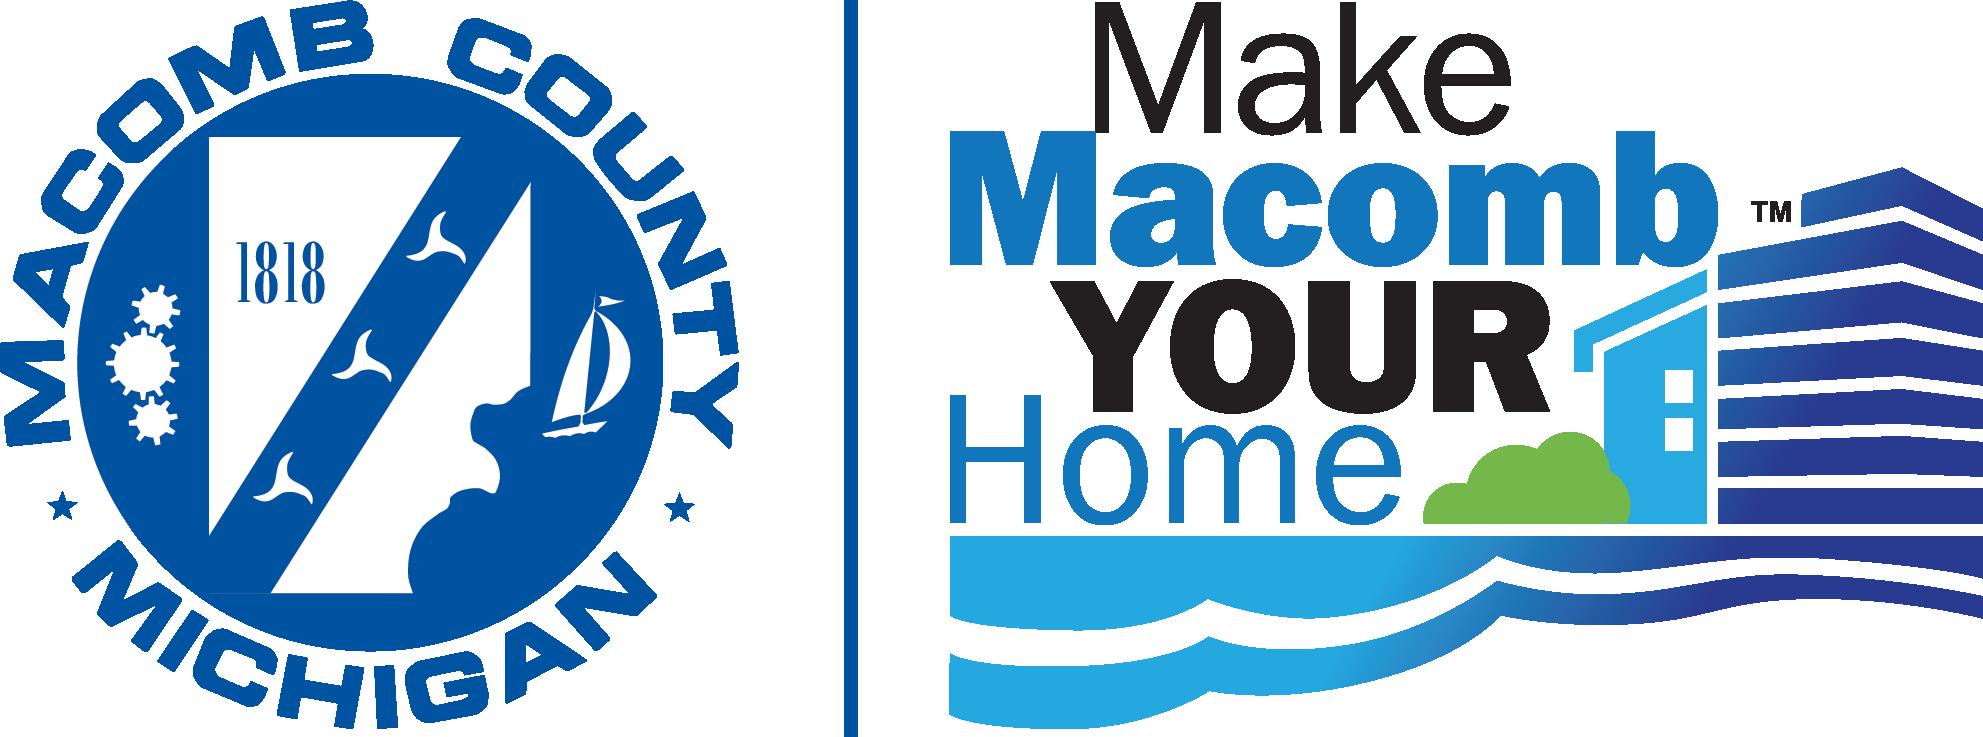 Make Macomb Your Home